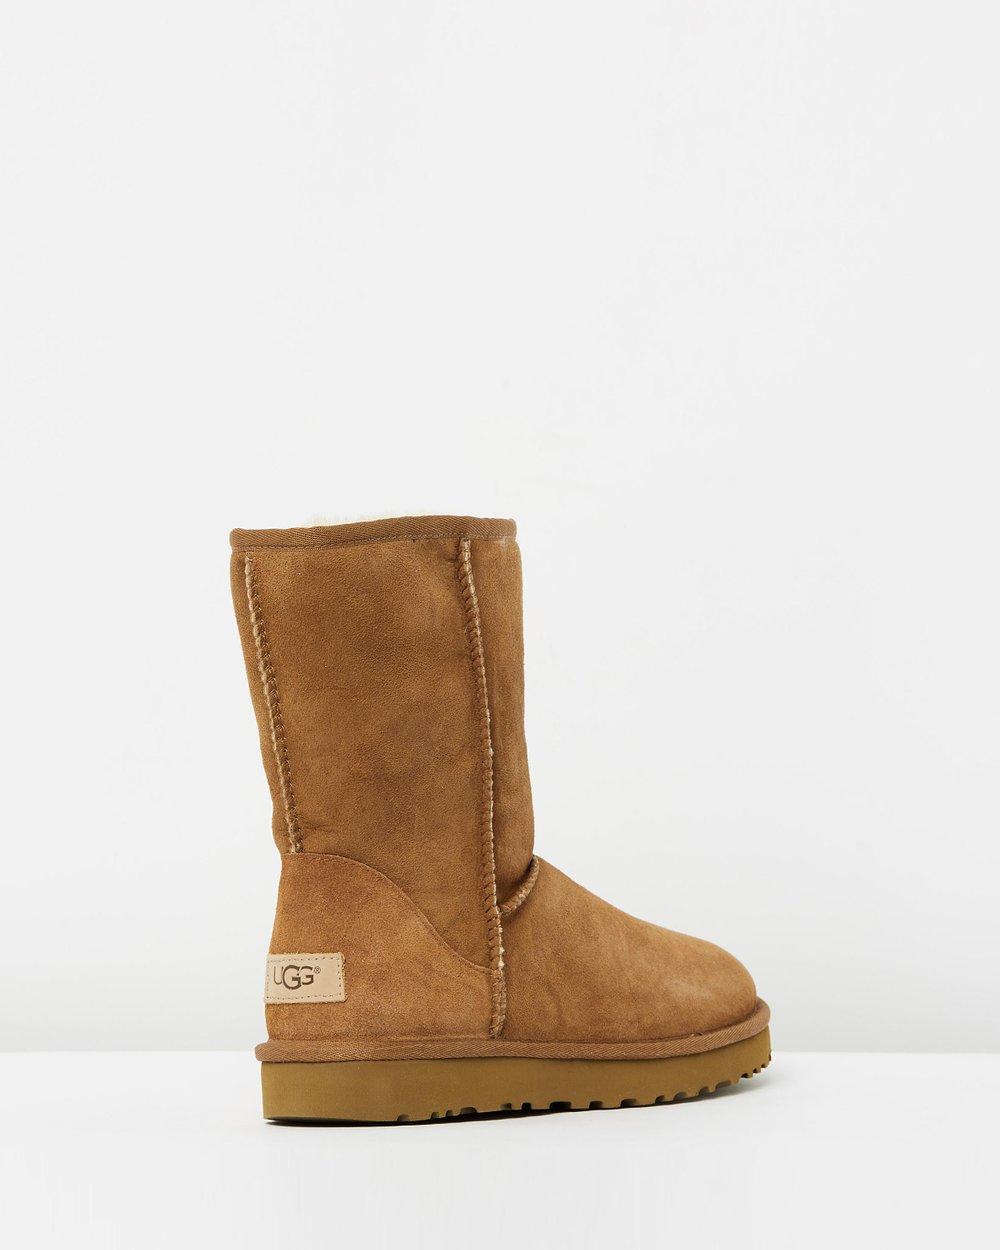 490b82926b9 Women's Classic II Short Boots